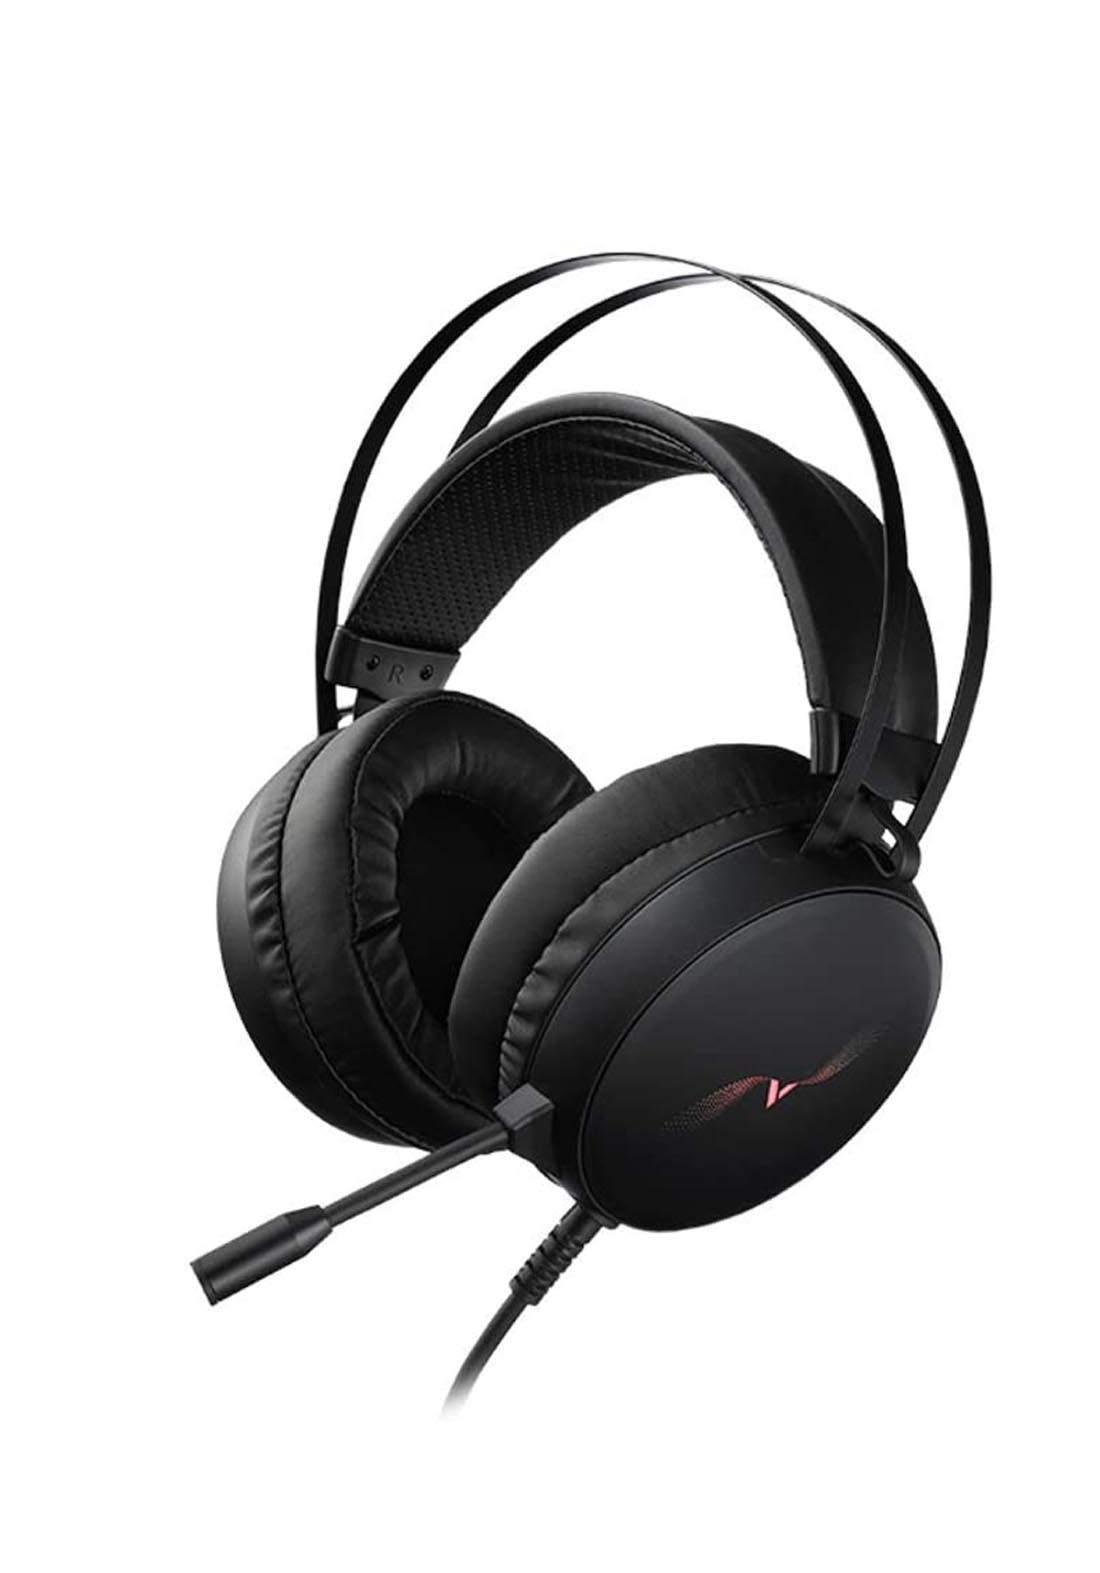 RAPOO VH310 Gaming Headset  - Black سماعة